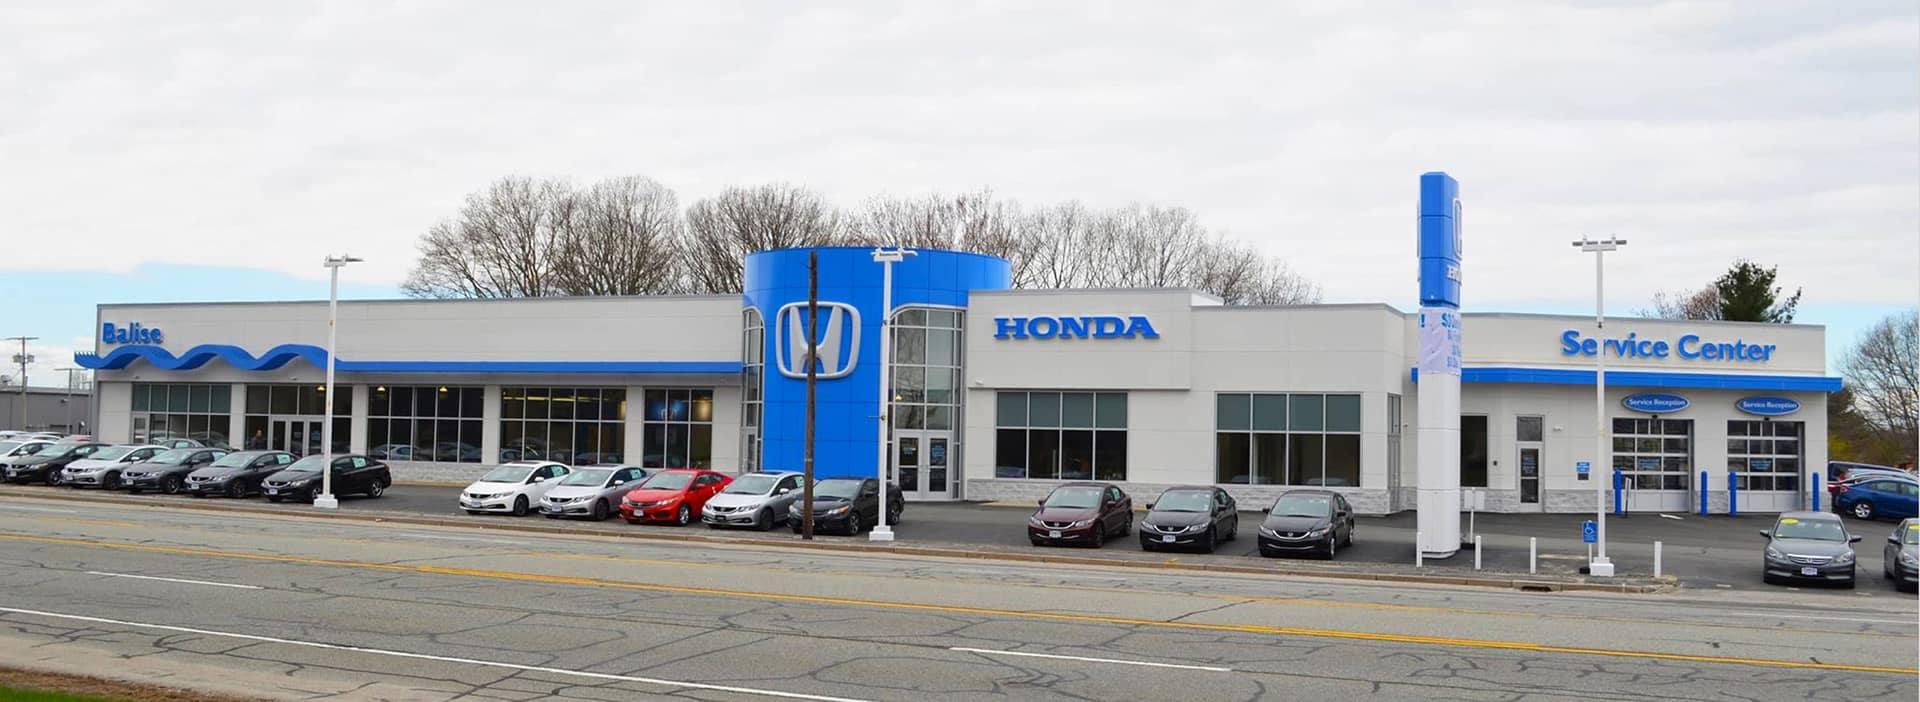 Balise Honda of West Warwick dealership exterior